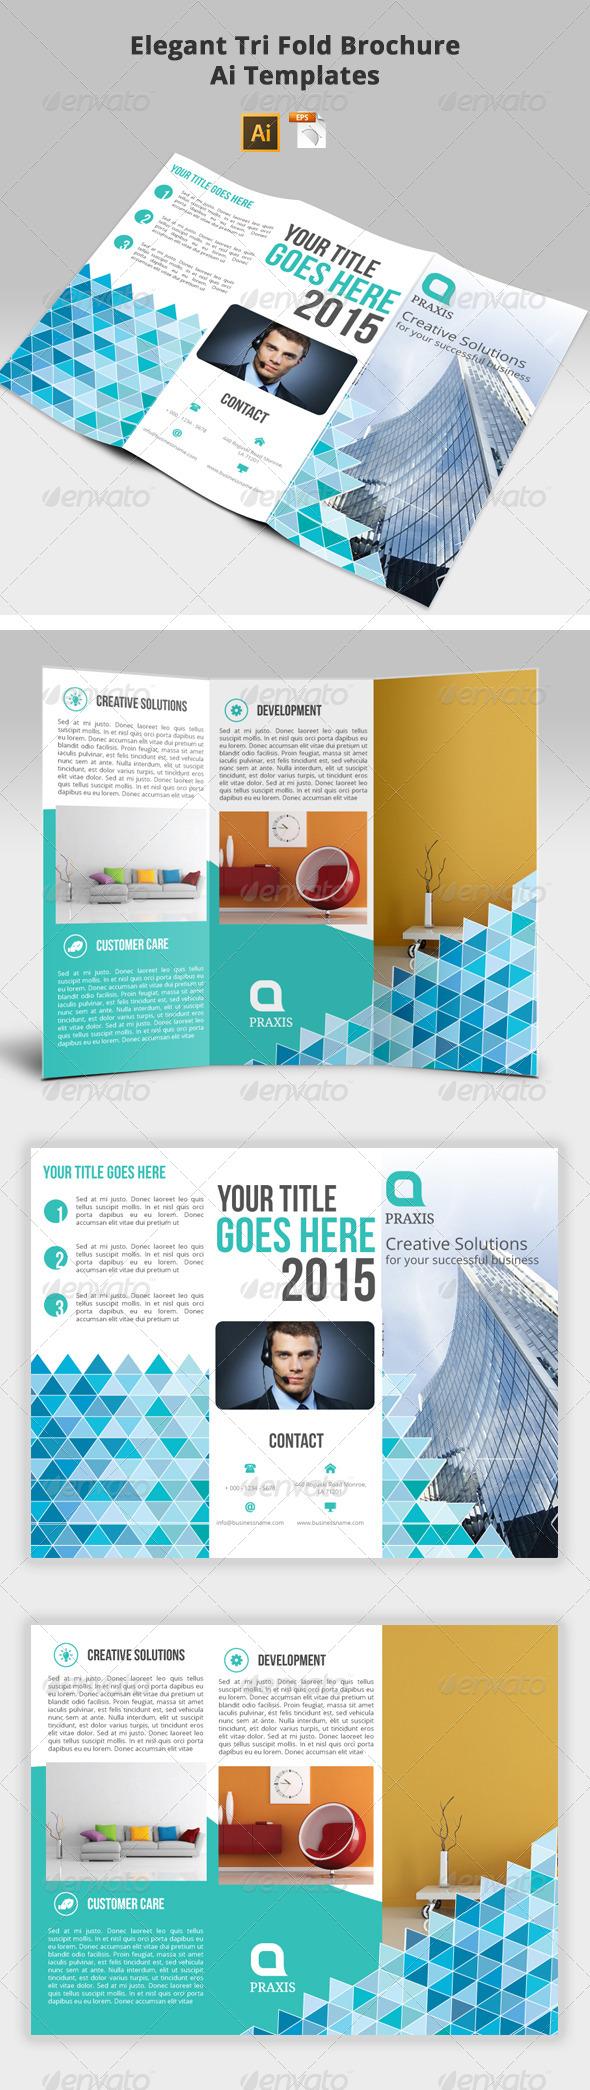 GraphicRiver Elegant Tri-Fold Brochure Ai Templates 7458871